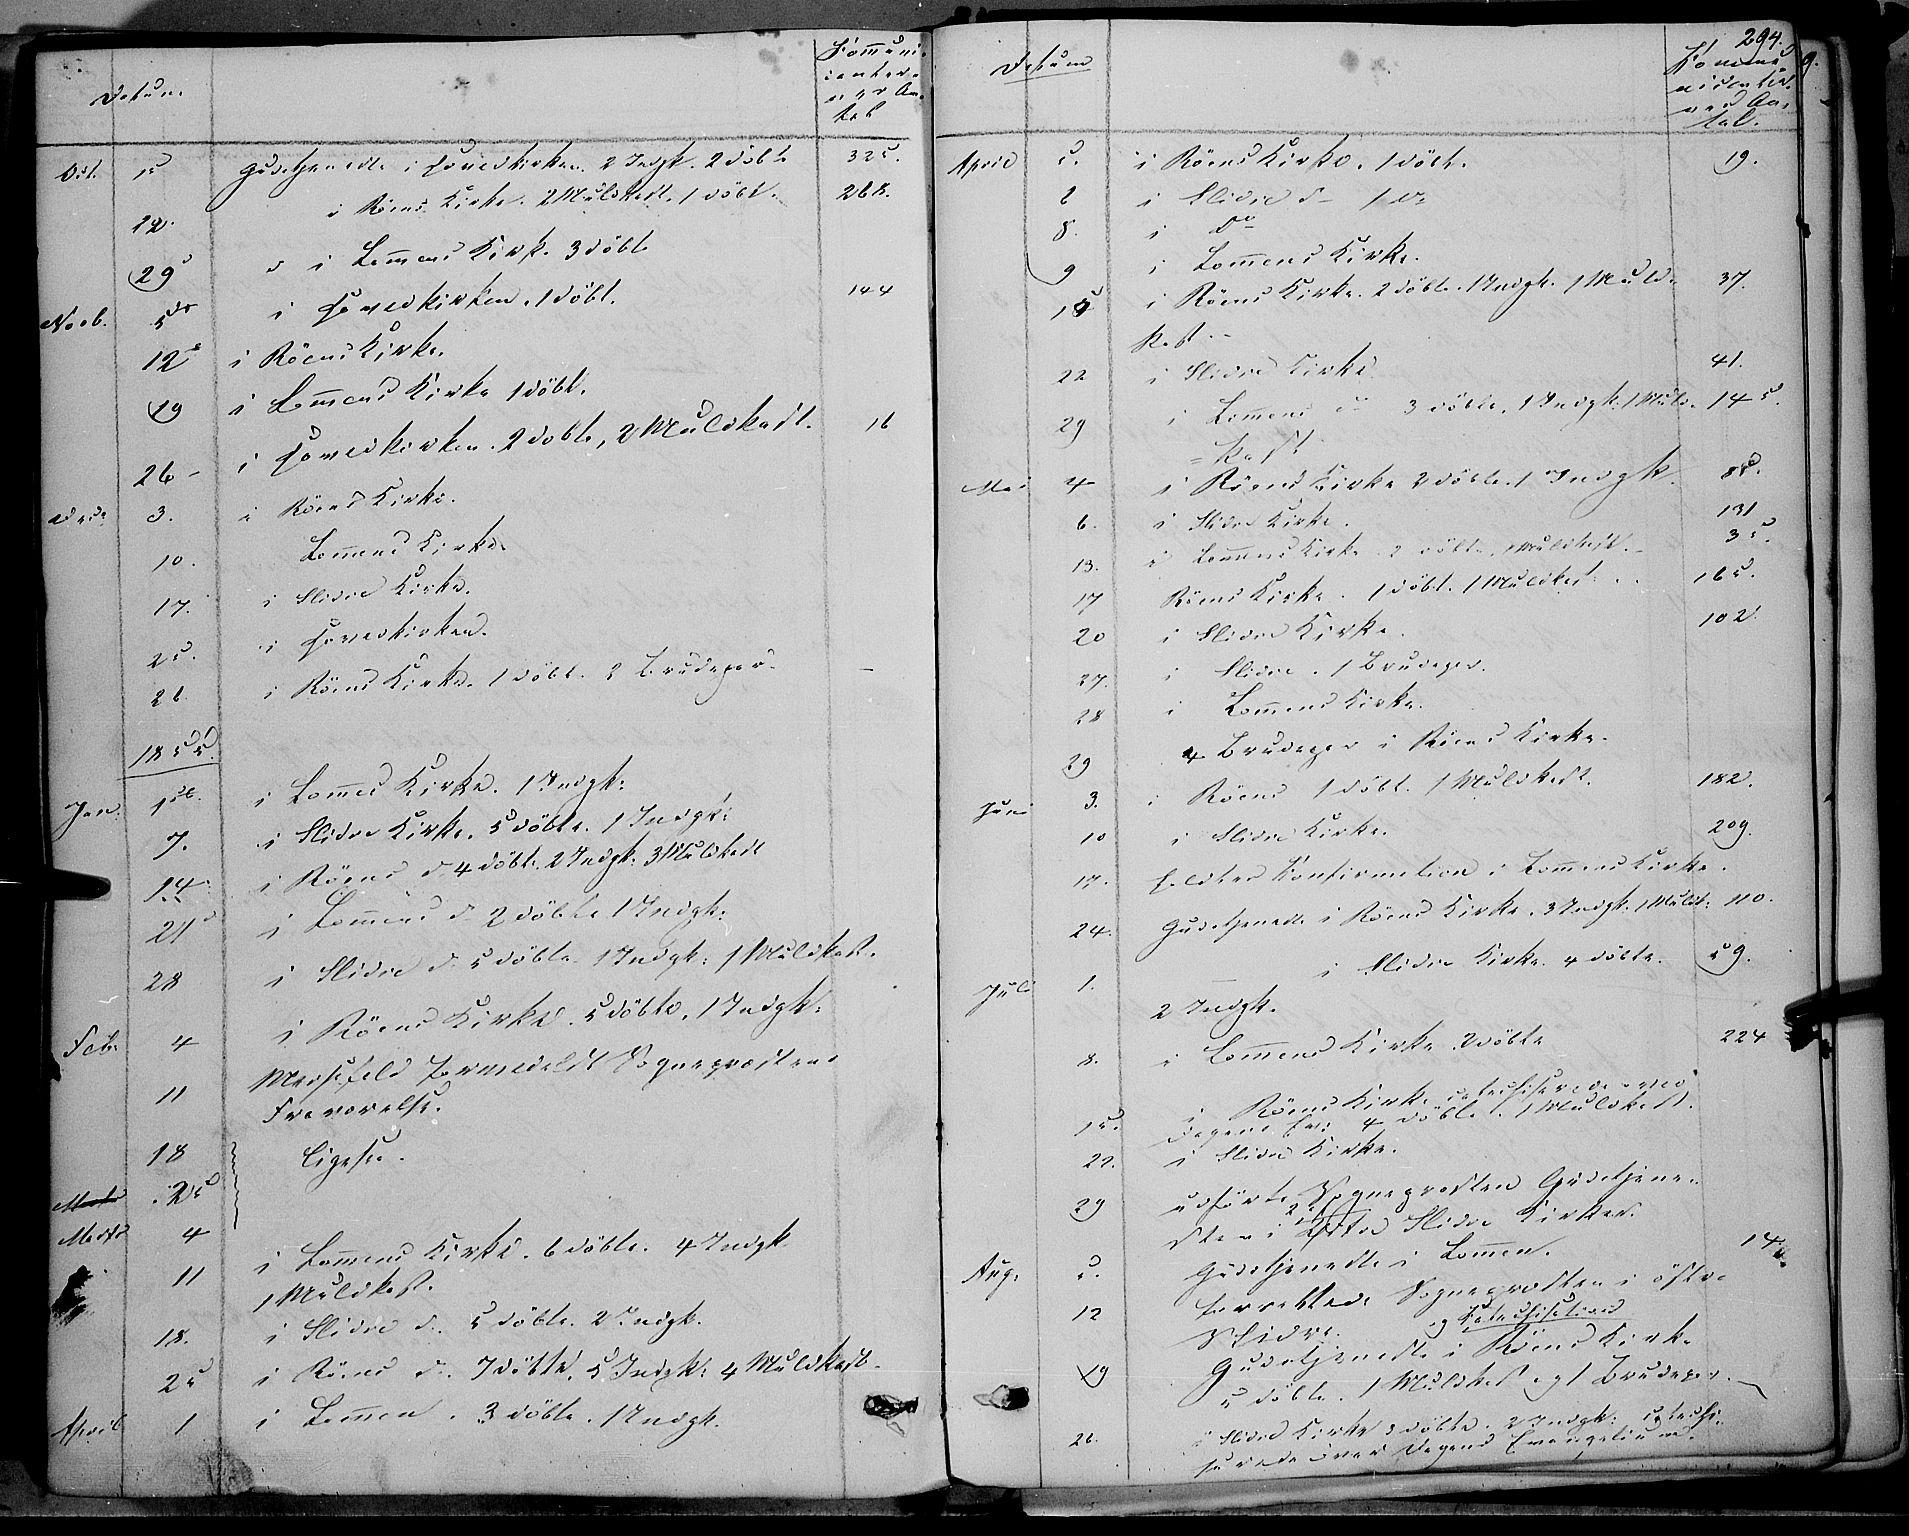 SAH, Vestre Slidre prestekontor, Ministerialbok nr. 1, 1844-1855, s. 294